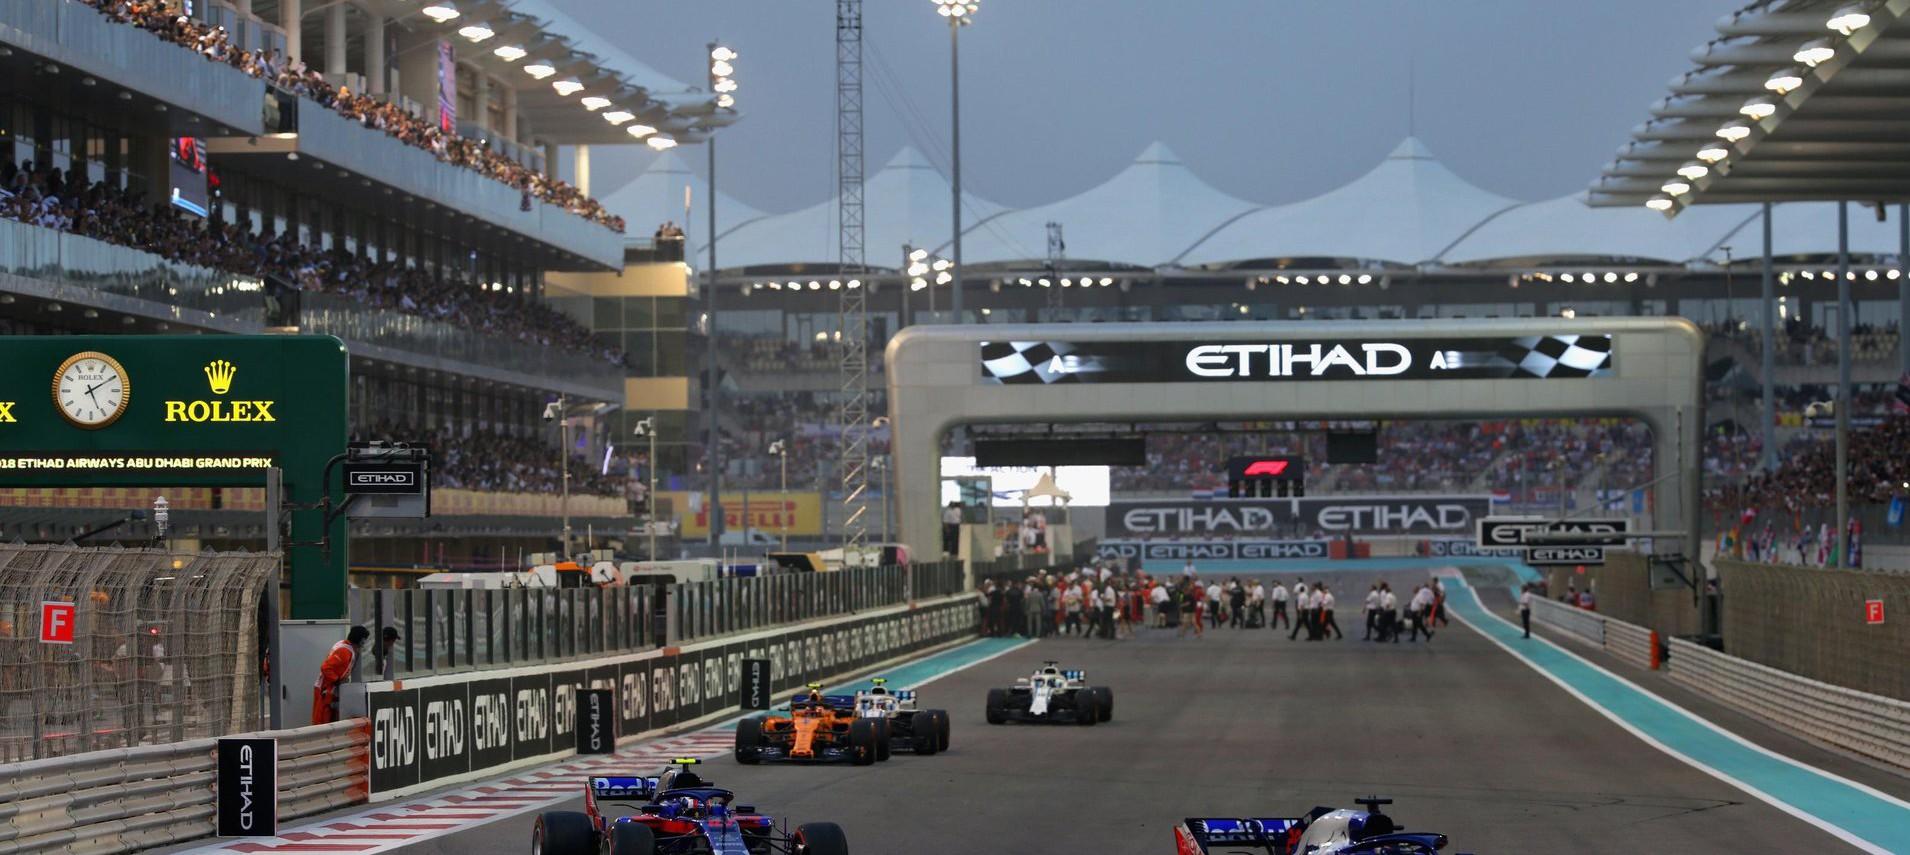 2018 Abu Dhabi GP – Gallery 1